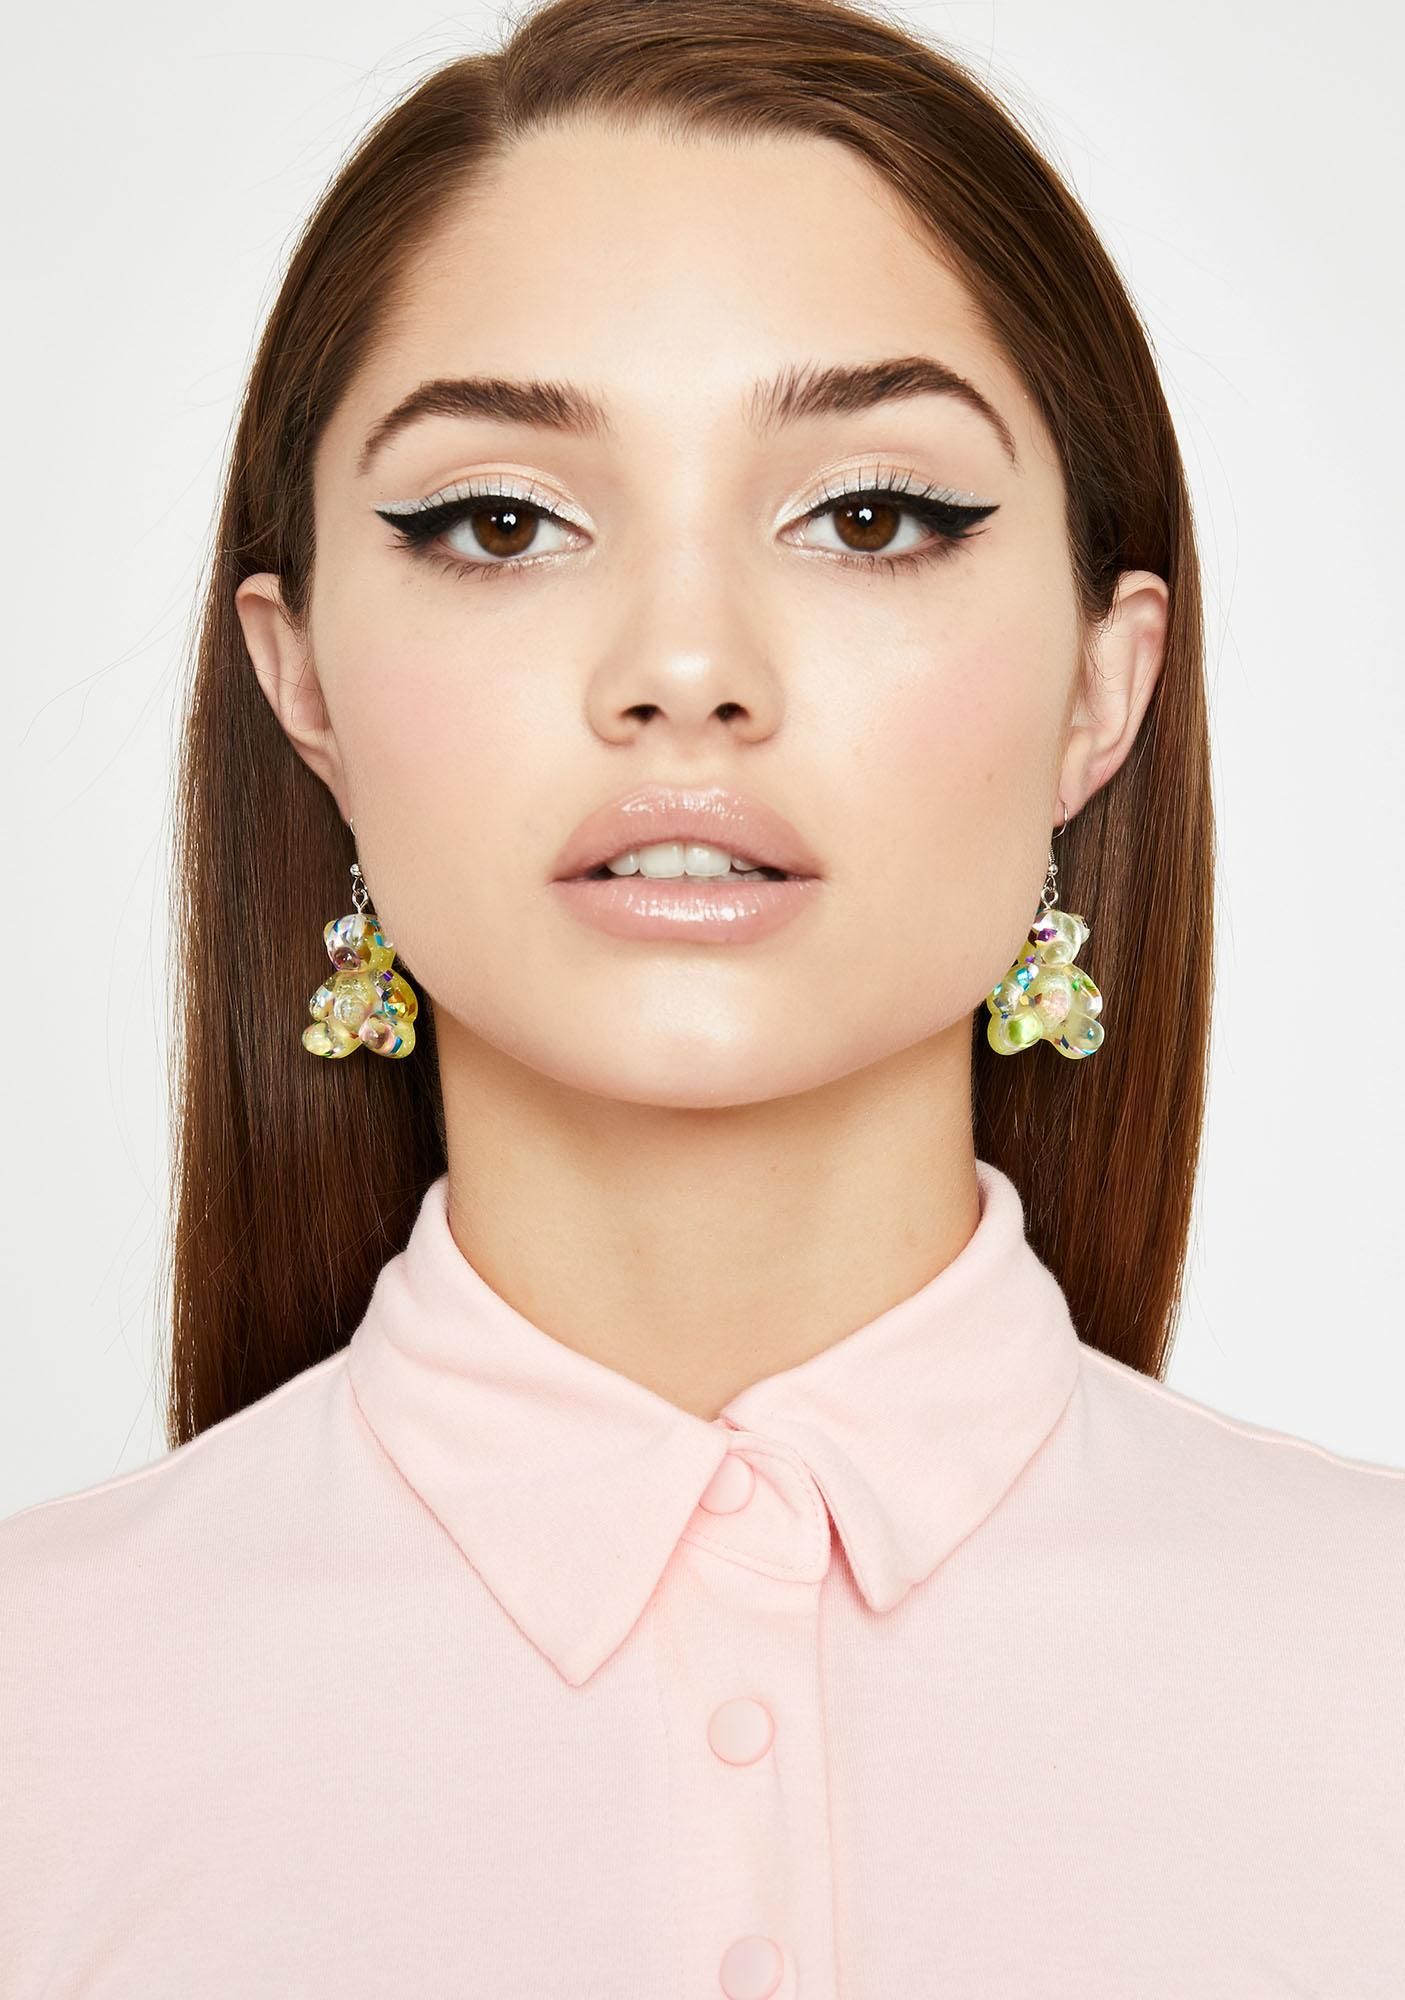 Lemon Sugar Rushin' Gummy Bear Earrings